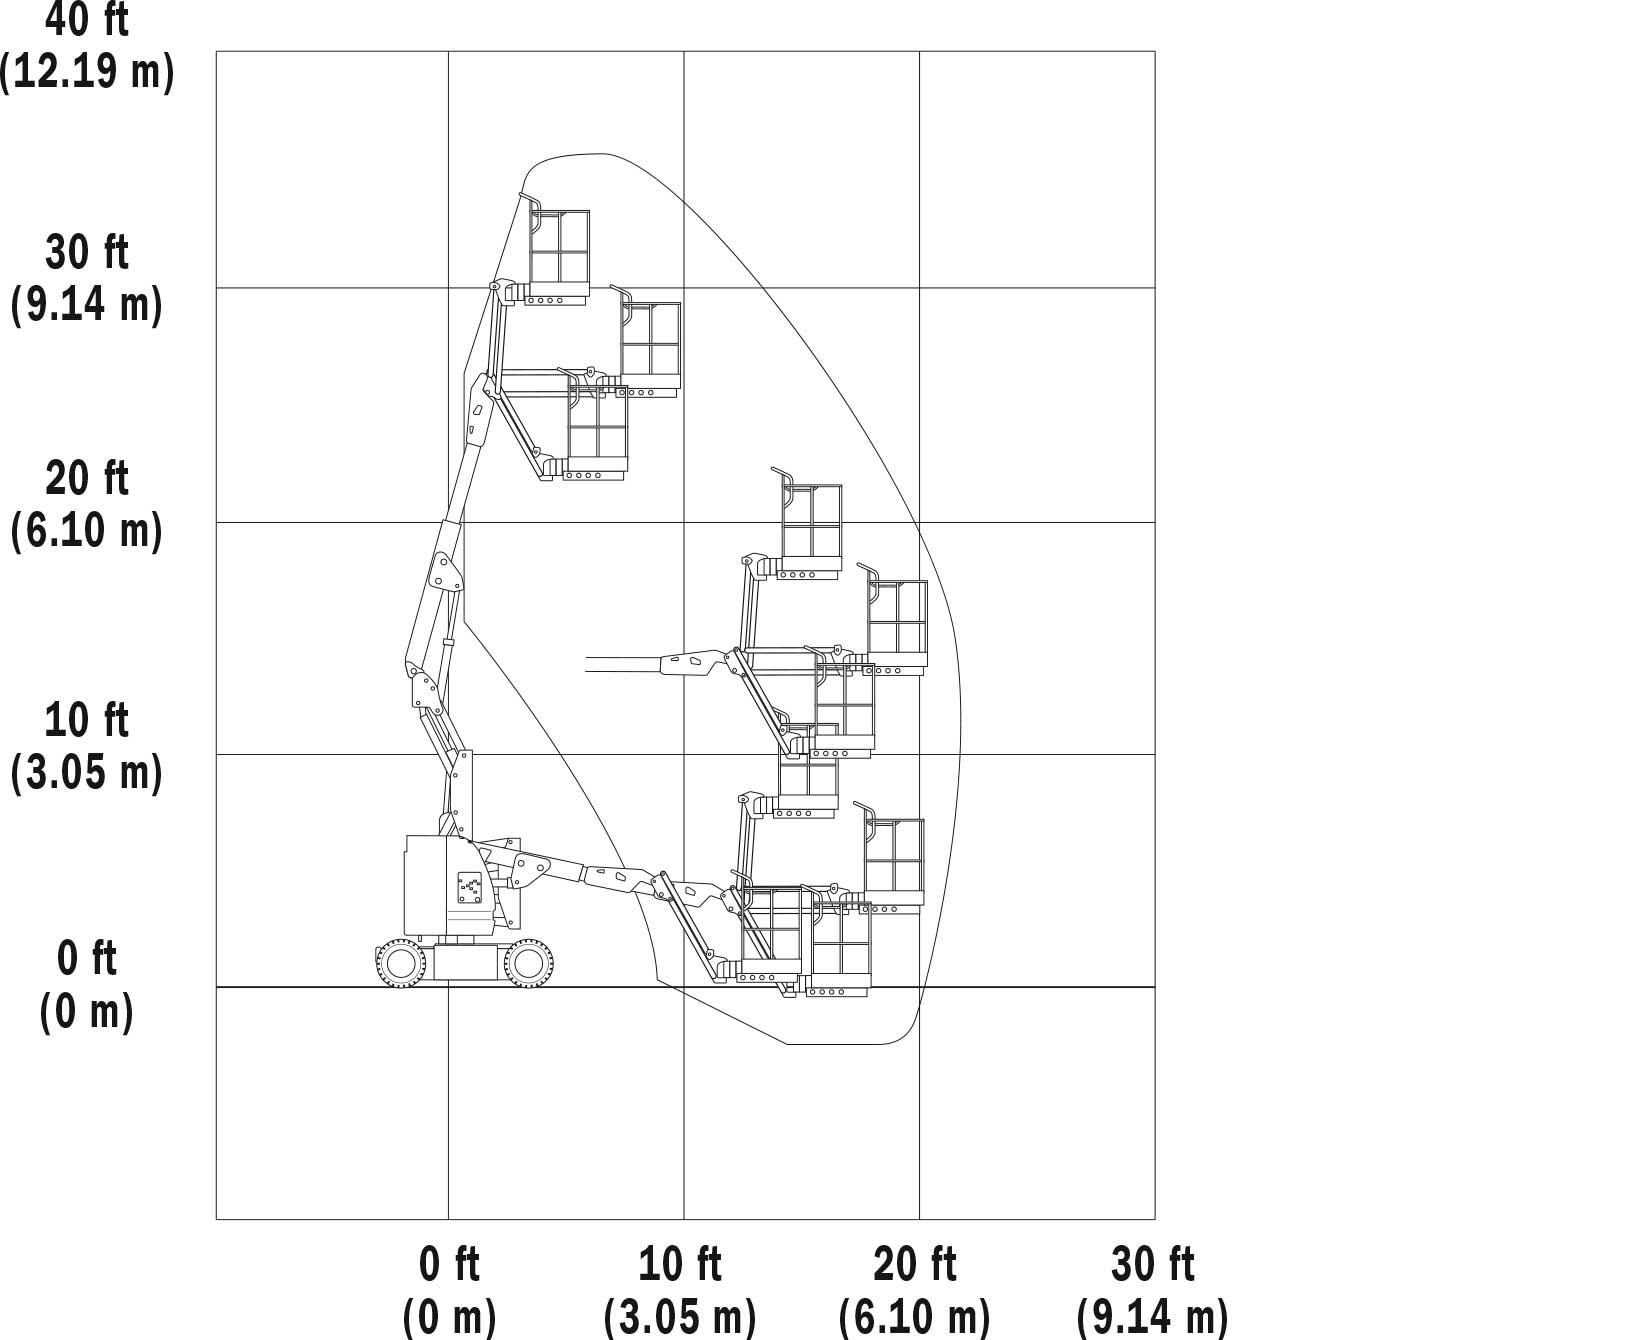 JLG E300AJ Articulating Boom Lift Reach Diagram